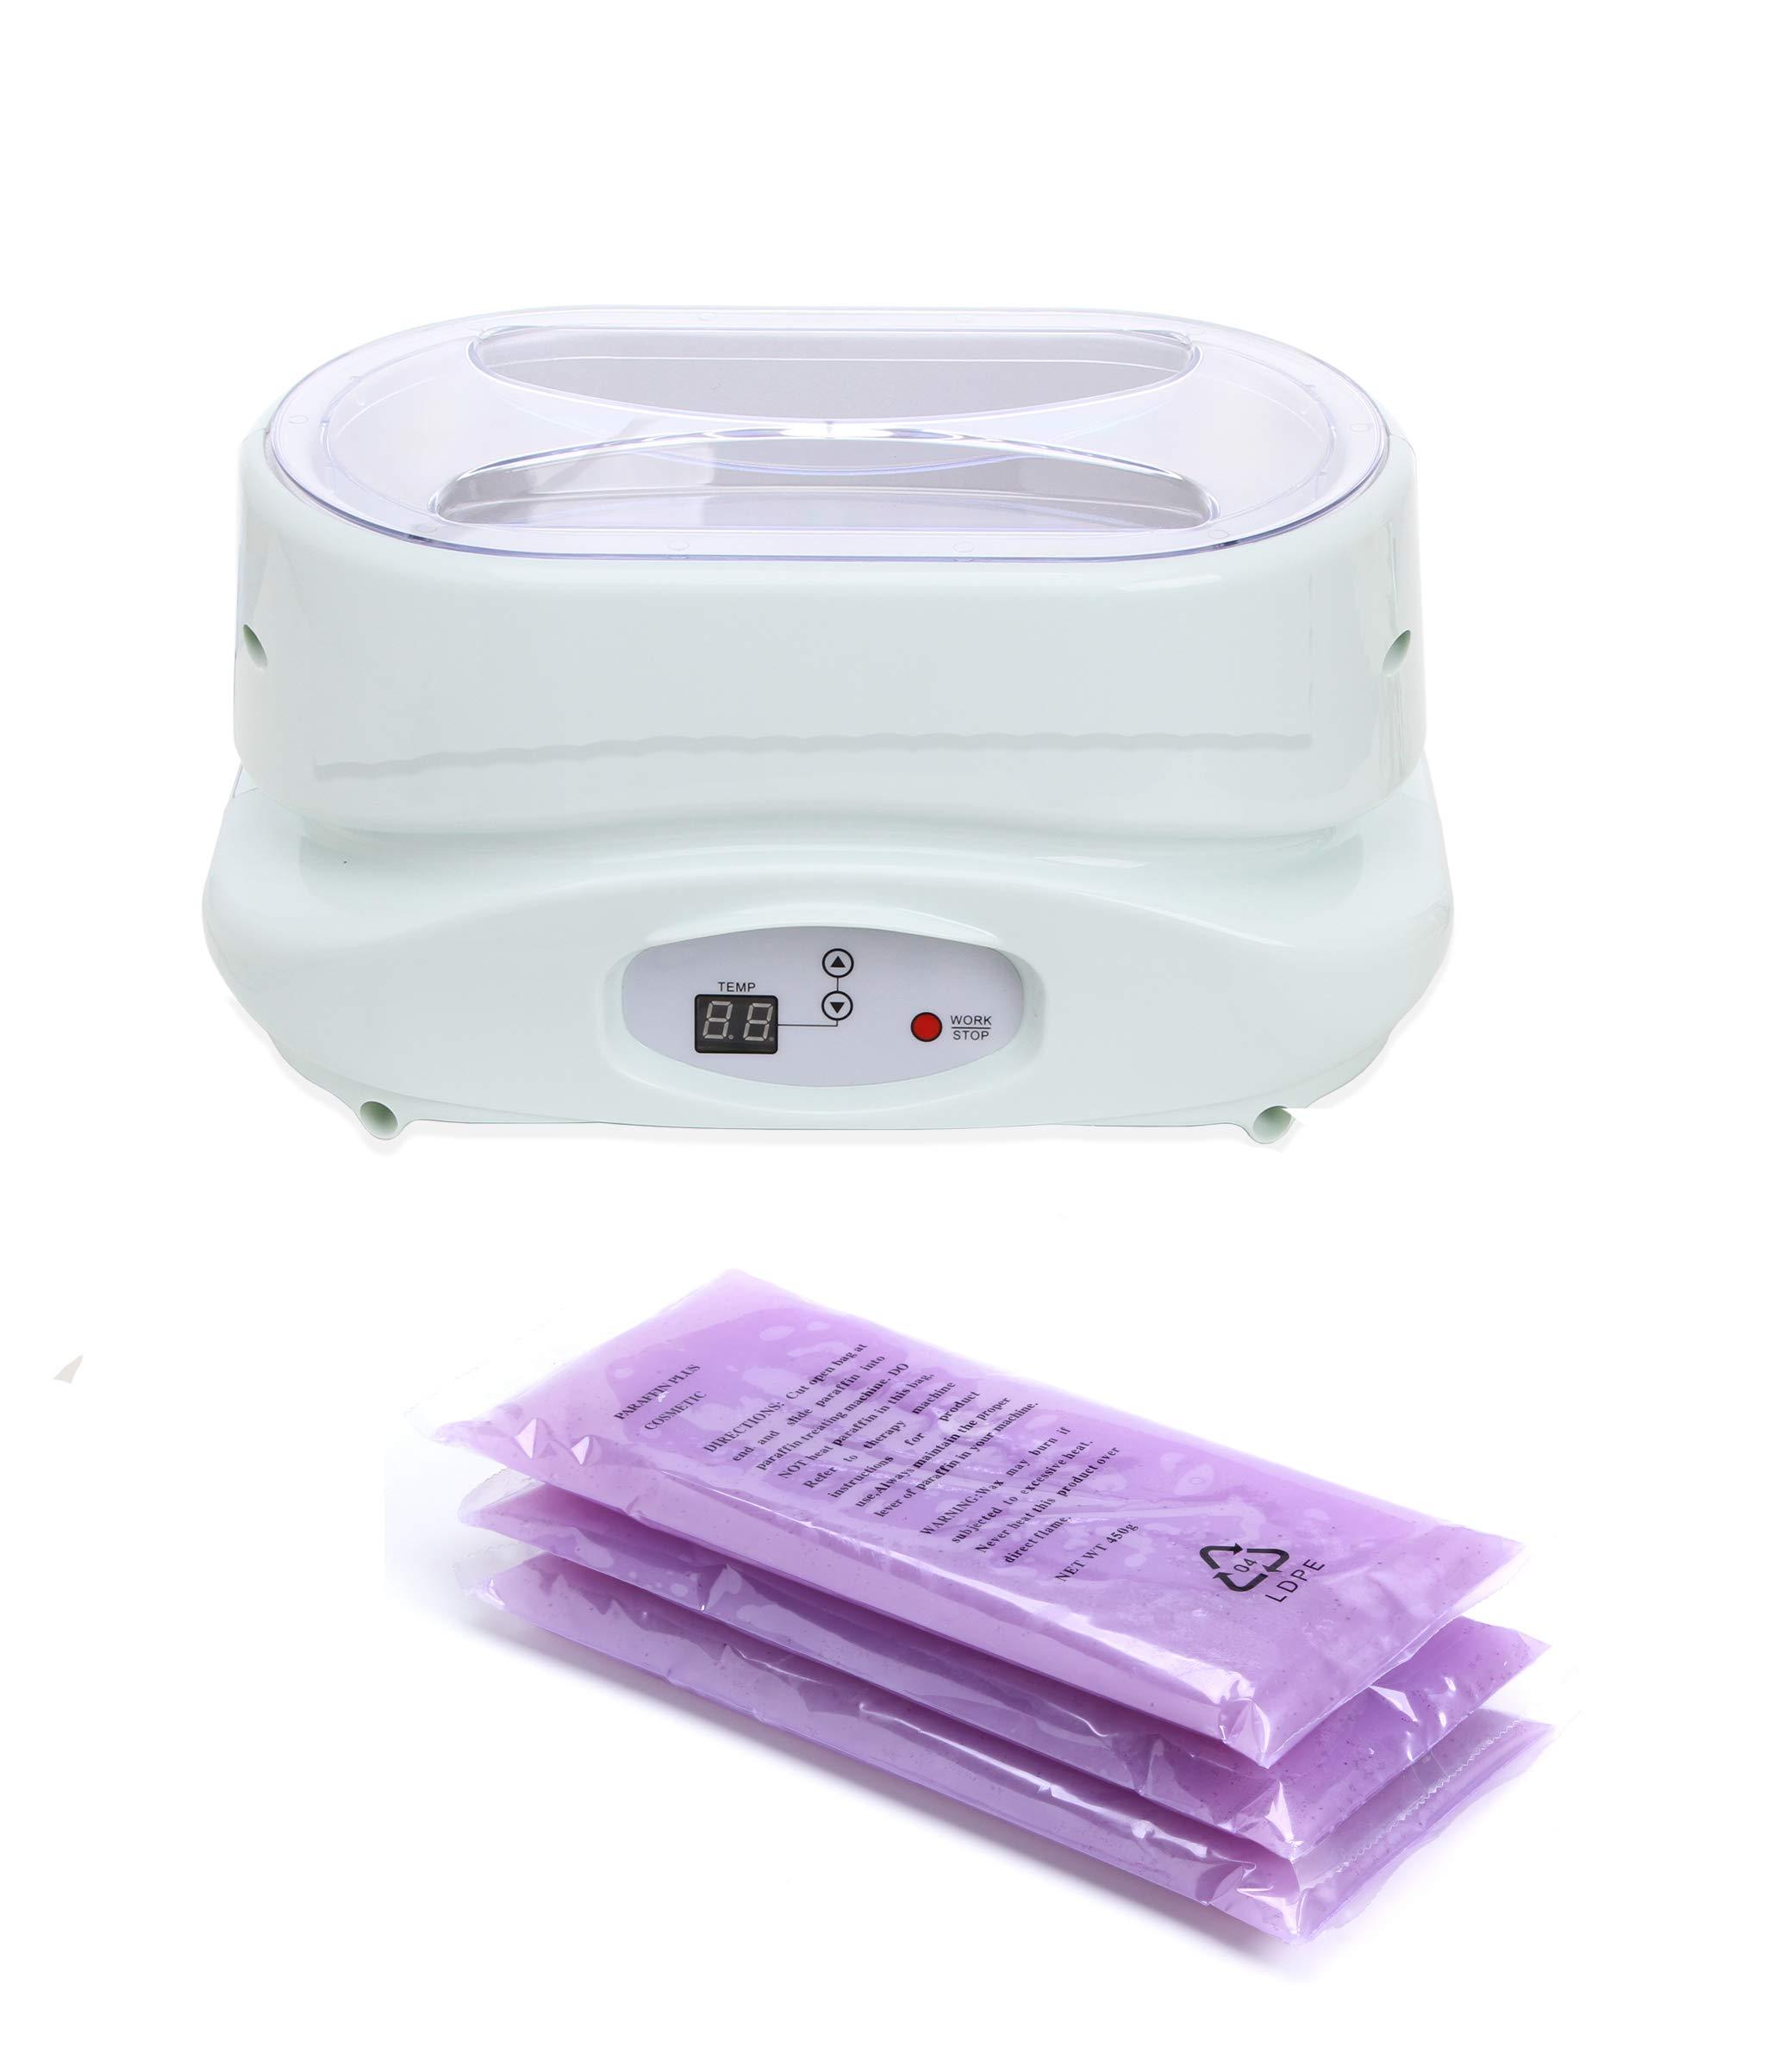 Digital Paraffin Bath Wax Warmer Heater with Gloves and Wax TLC-5010W by eMark Beauty